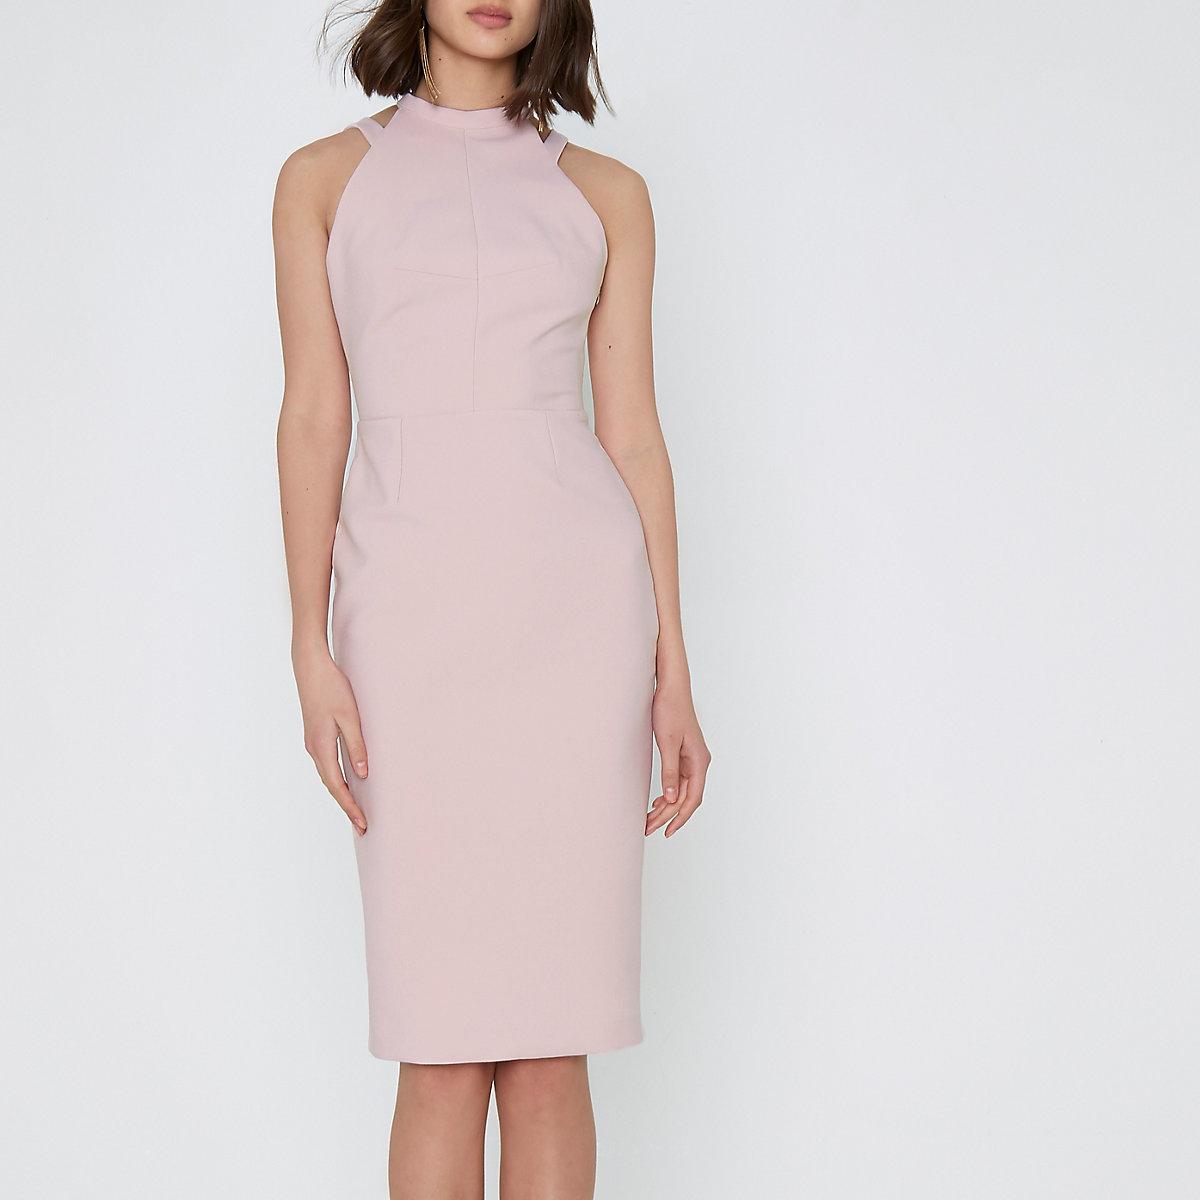 Light pink bow back sleeveless bodycon dress